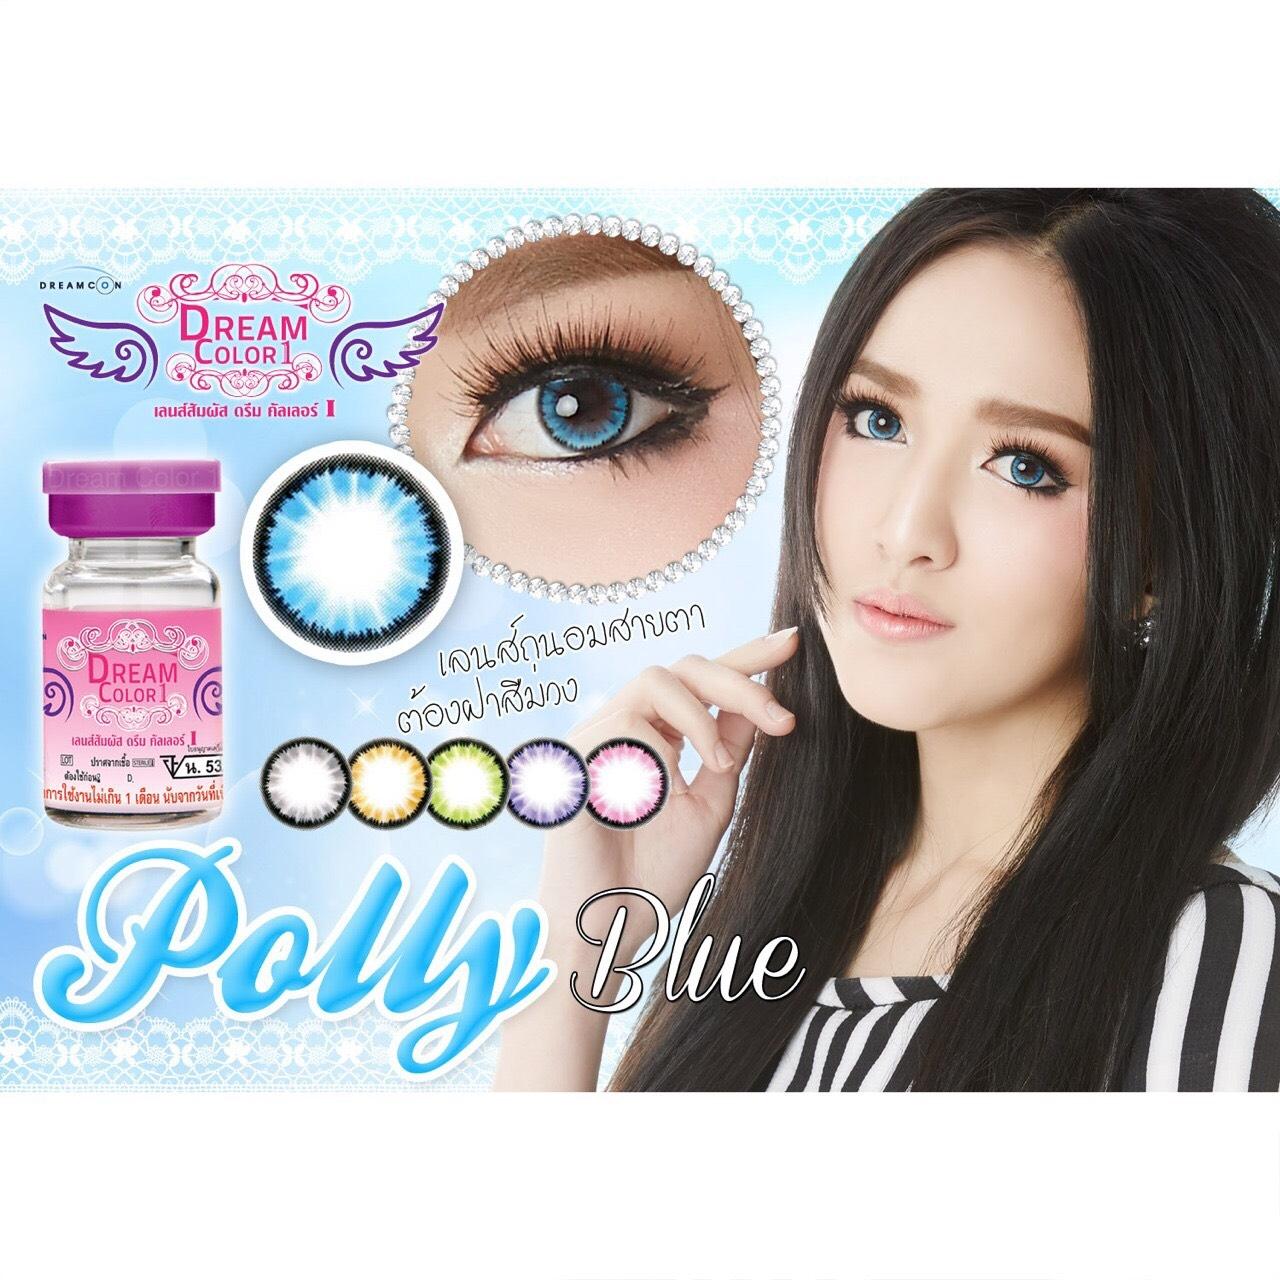 Polly Blue Dreamcolor1เลนส์นิ่มใส่สบาย คอนแทคเลนส์ ขายส่งคอนแทคเลนส์ ขายส่งBigeye Bigeyeเกาหลี